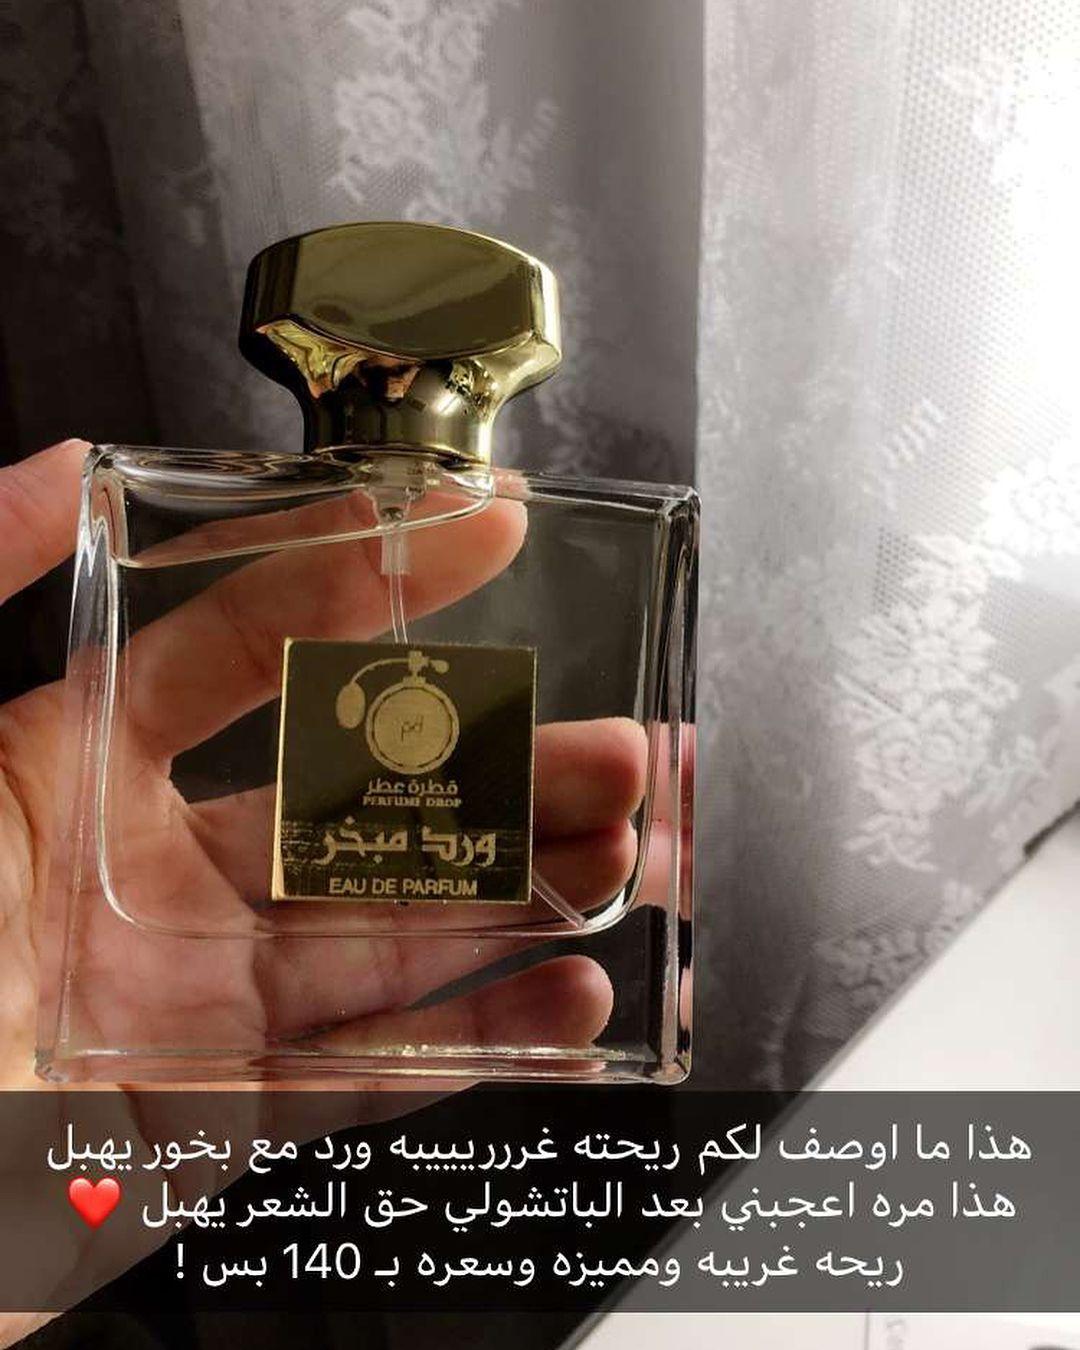 Pin By Arwa Ayam Arwa Ayam On Beauty Products Eau De Parfum Perfume Bottles Perfume